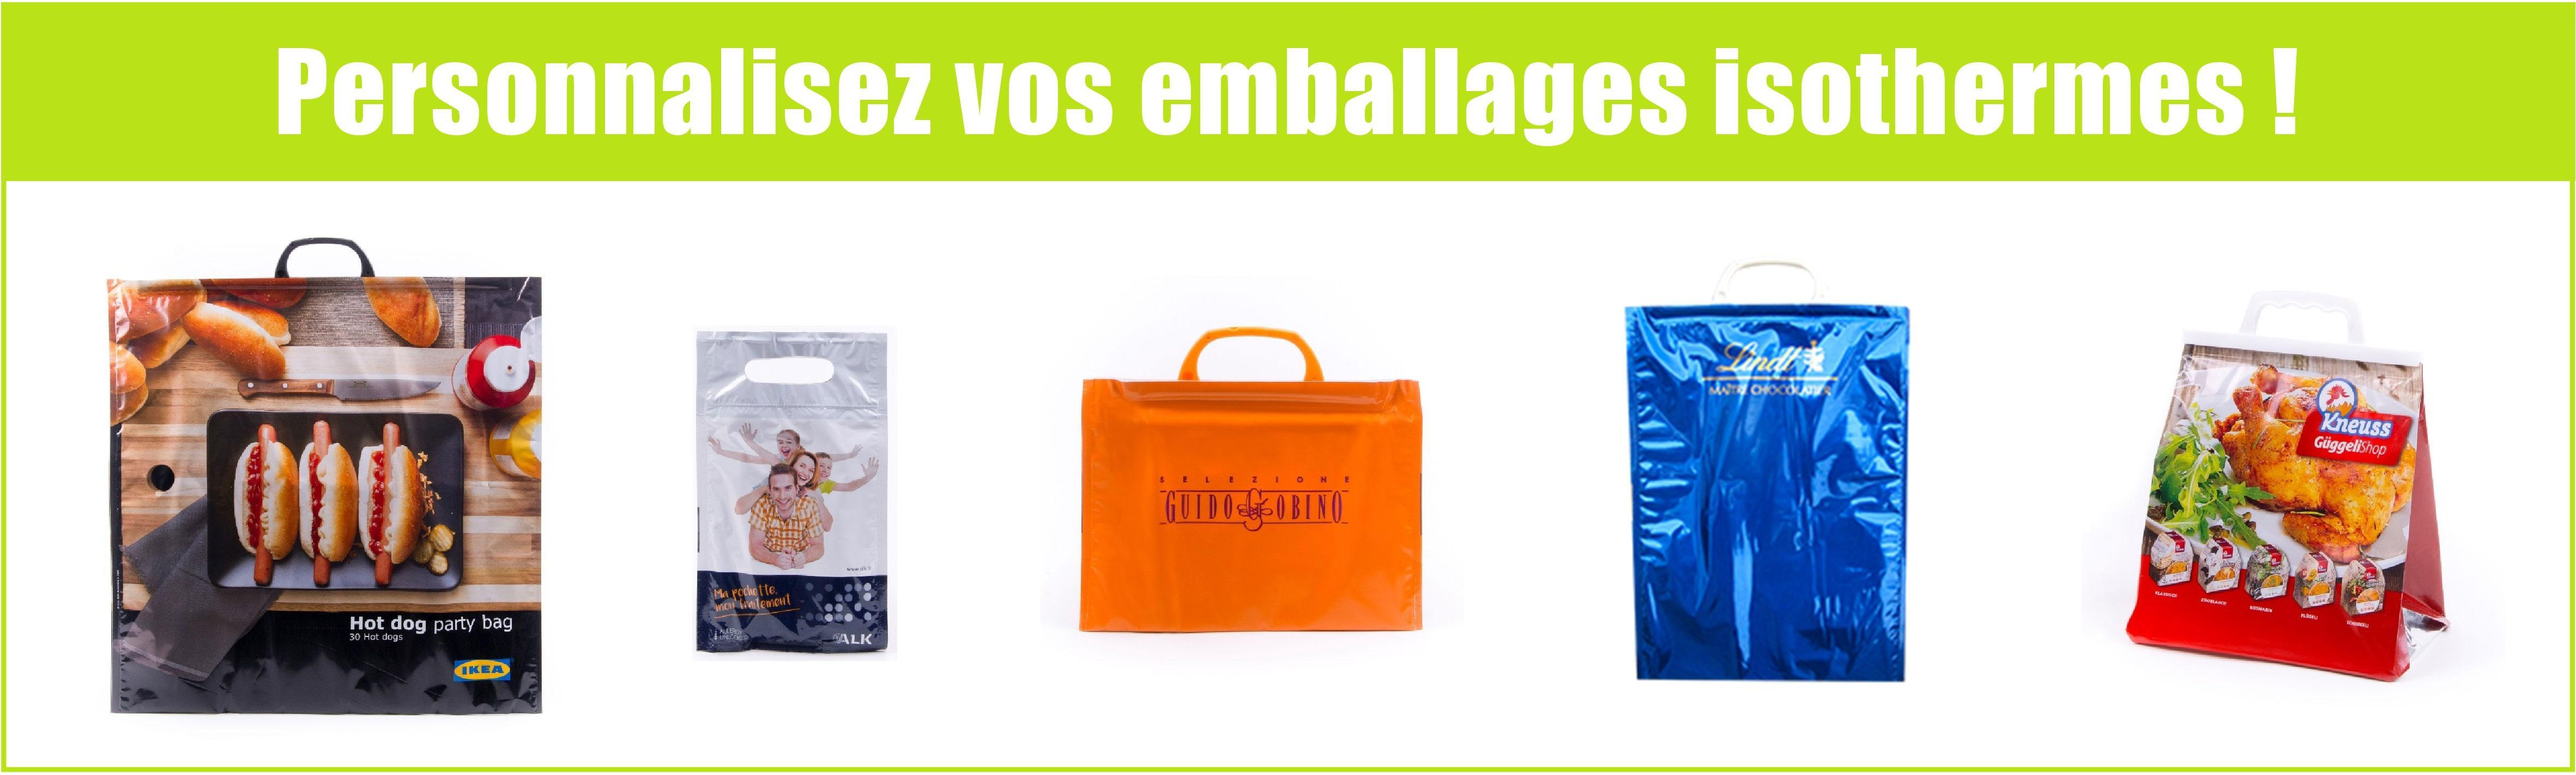 Emballages isothermes personnalisés